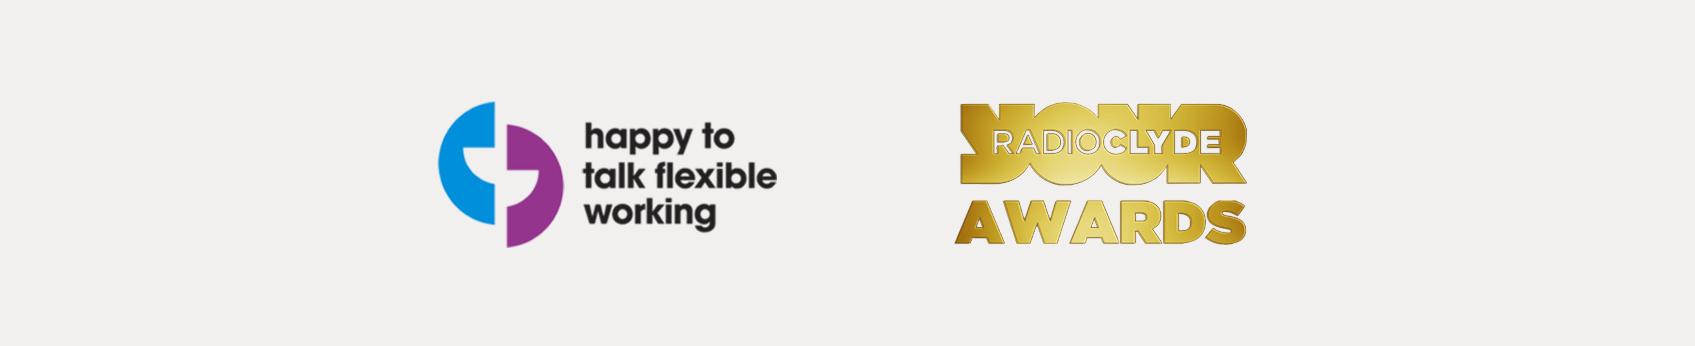 Radio clyde awards